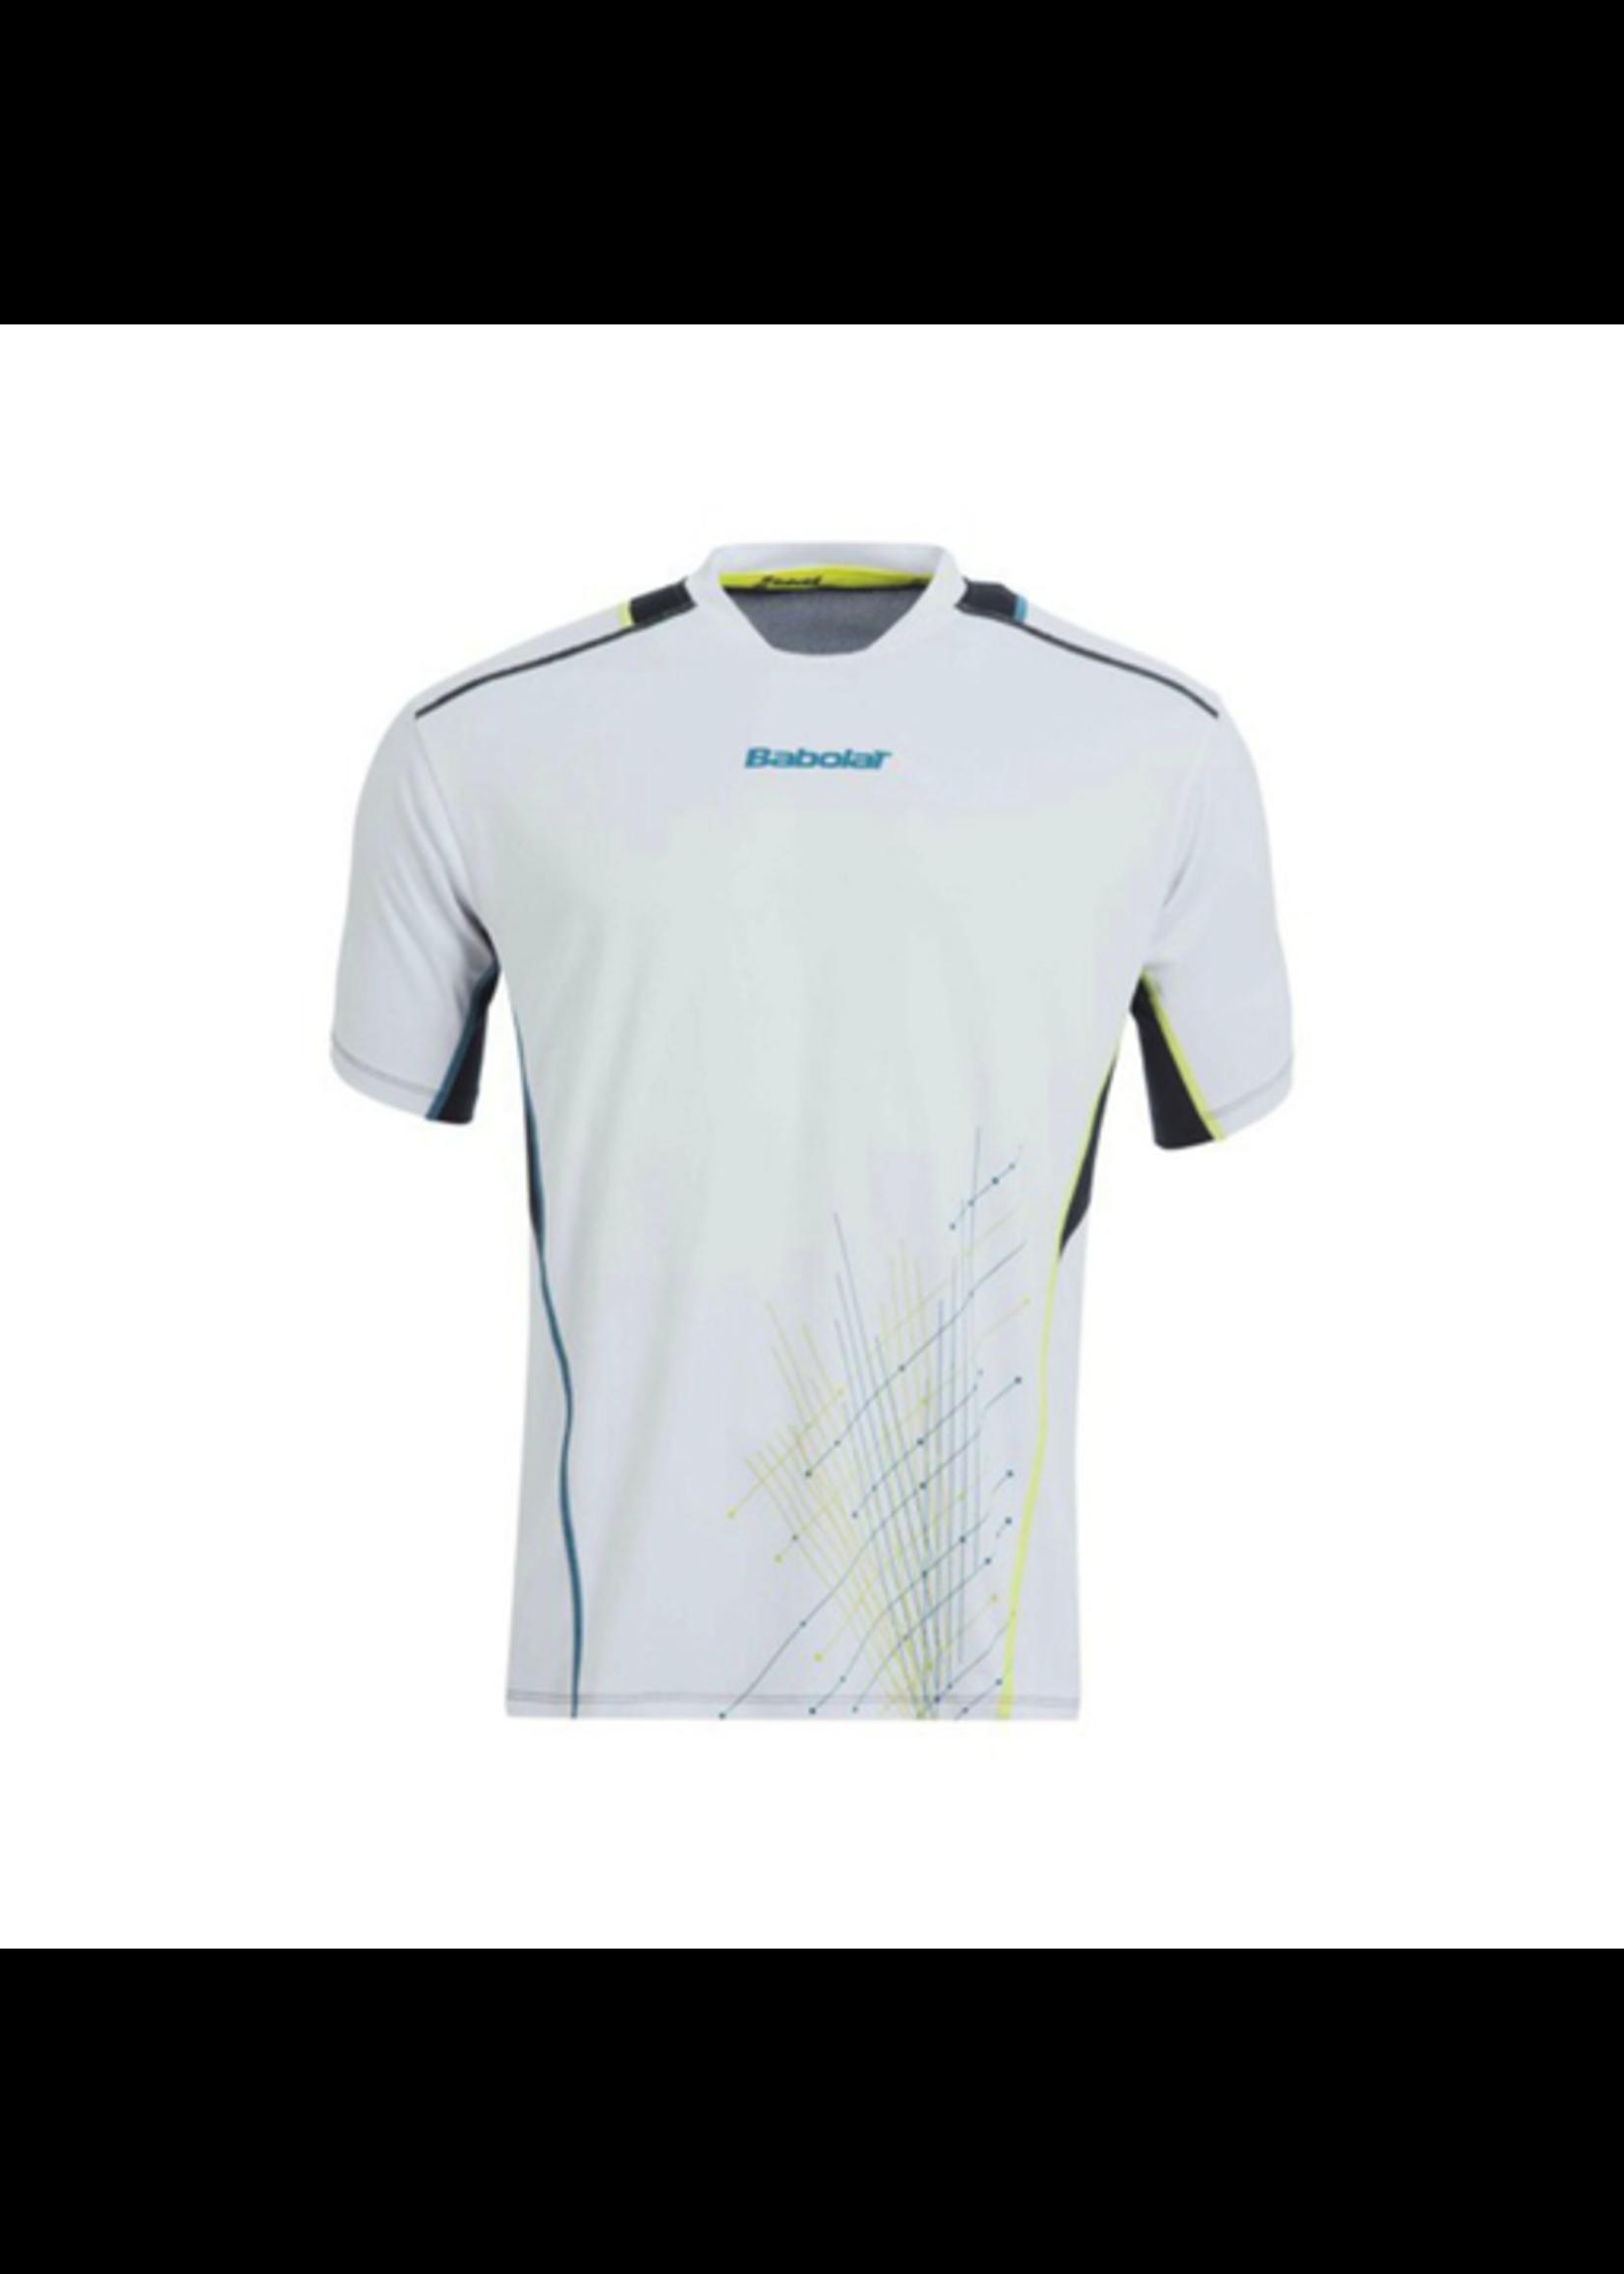 Babolat Babolat Mens Match Performance Top White XL